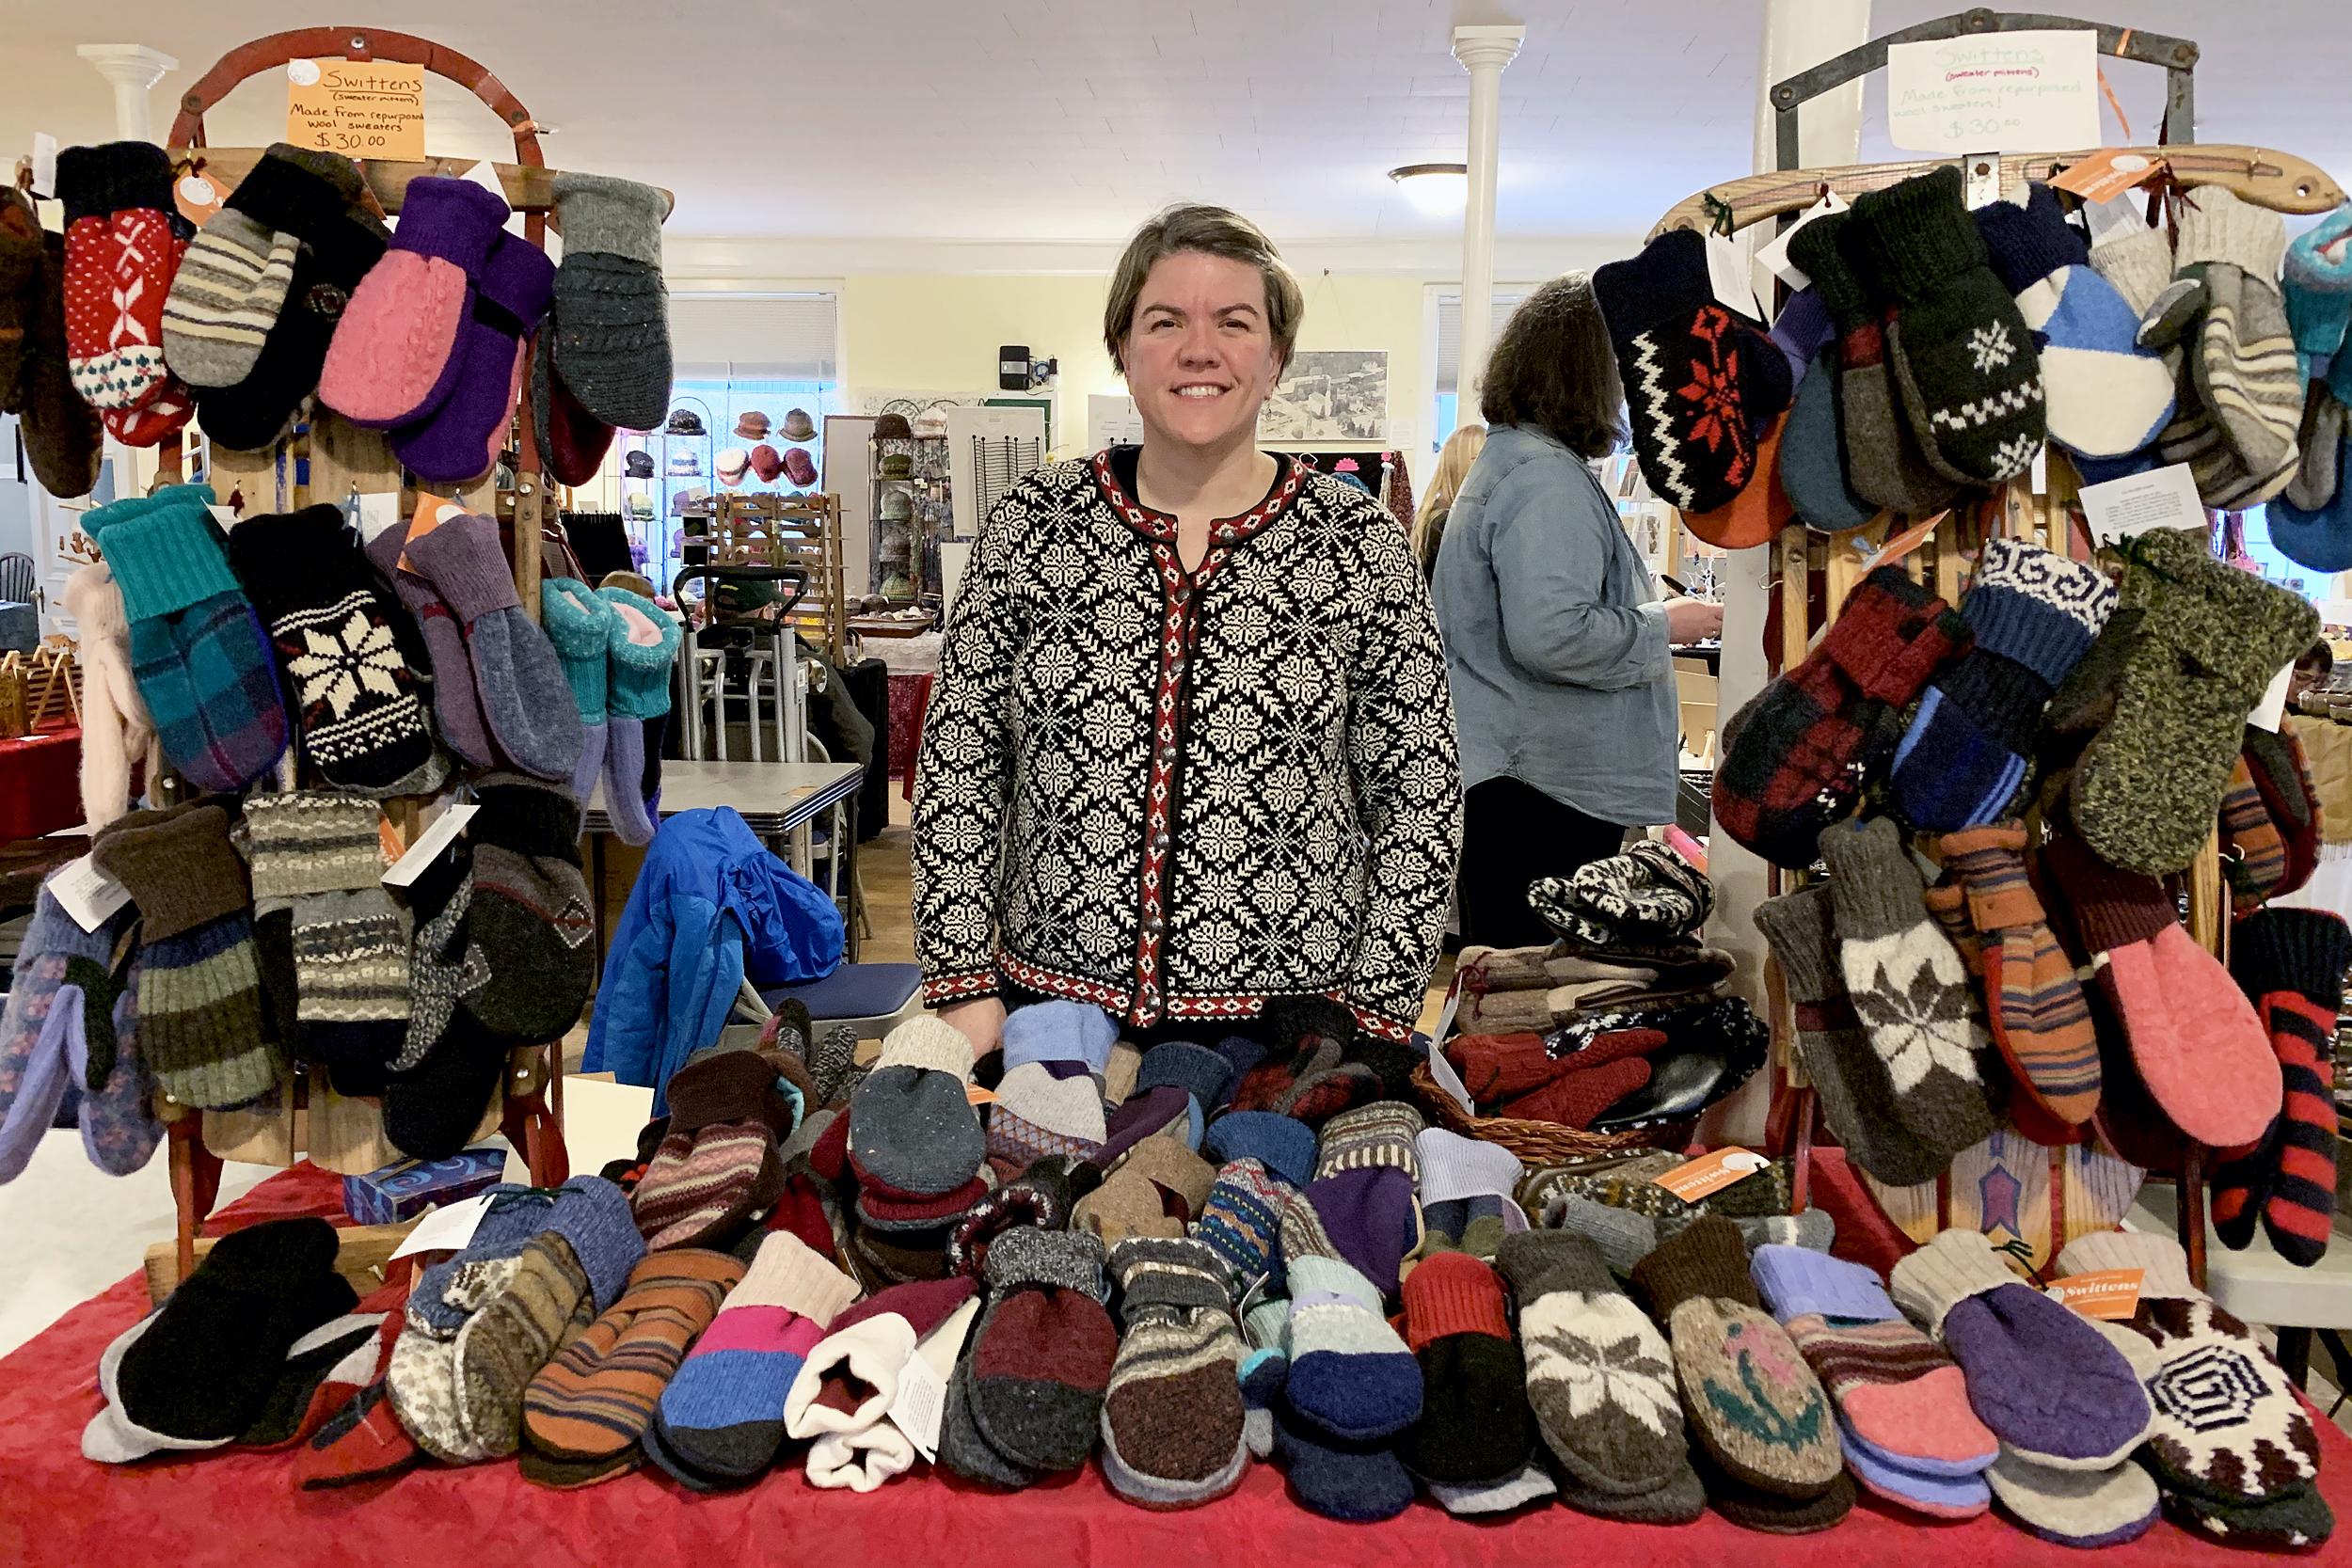 Meet the Vermont teacher behind Bernie Sanders' viral mittens